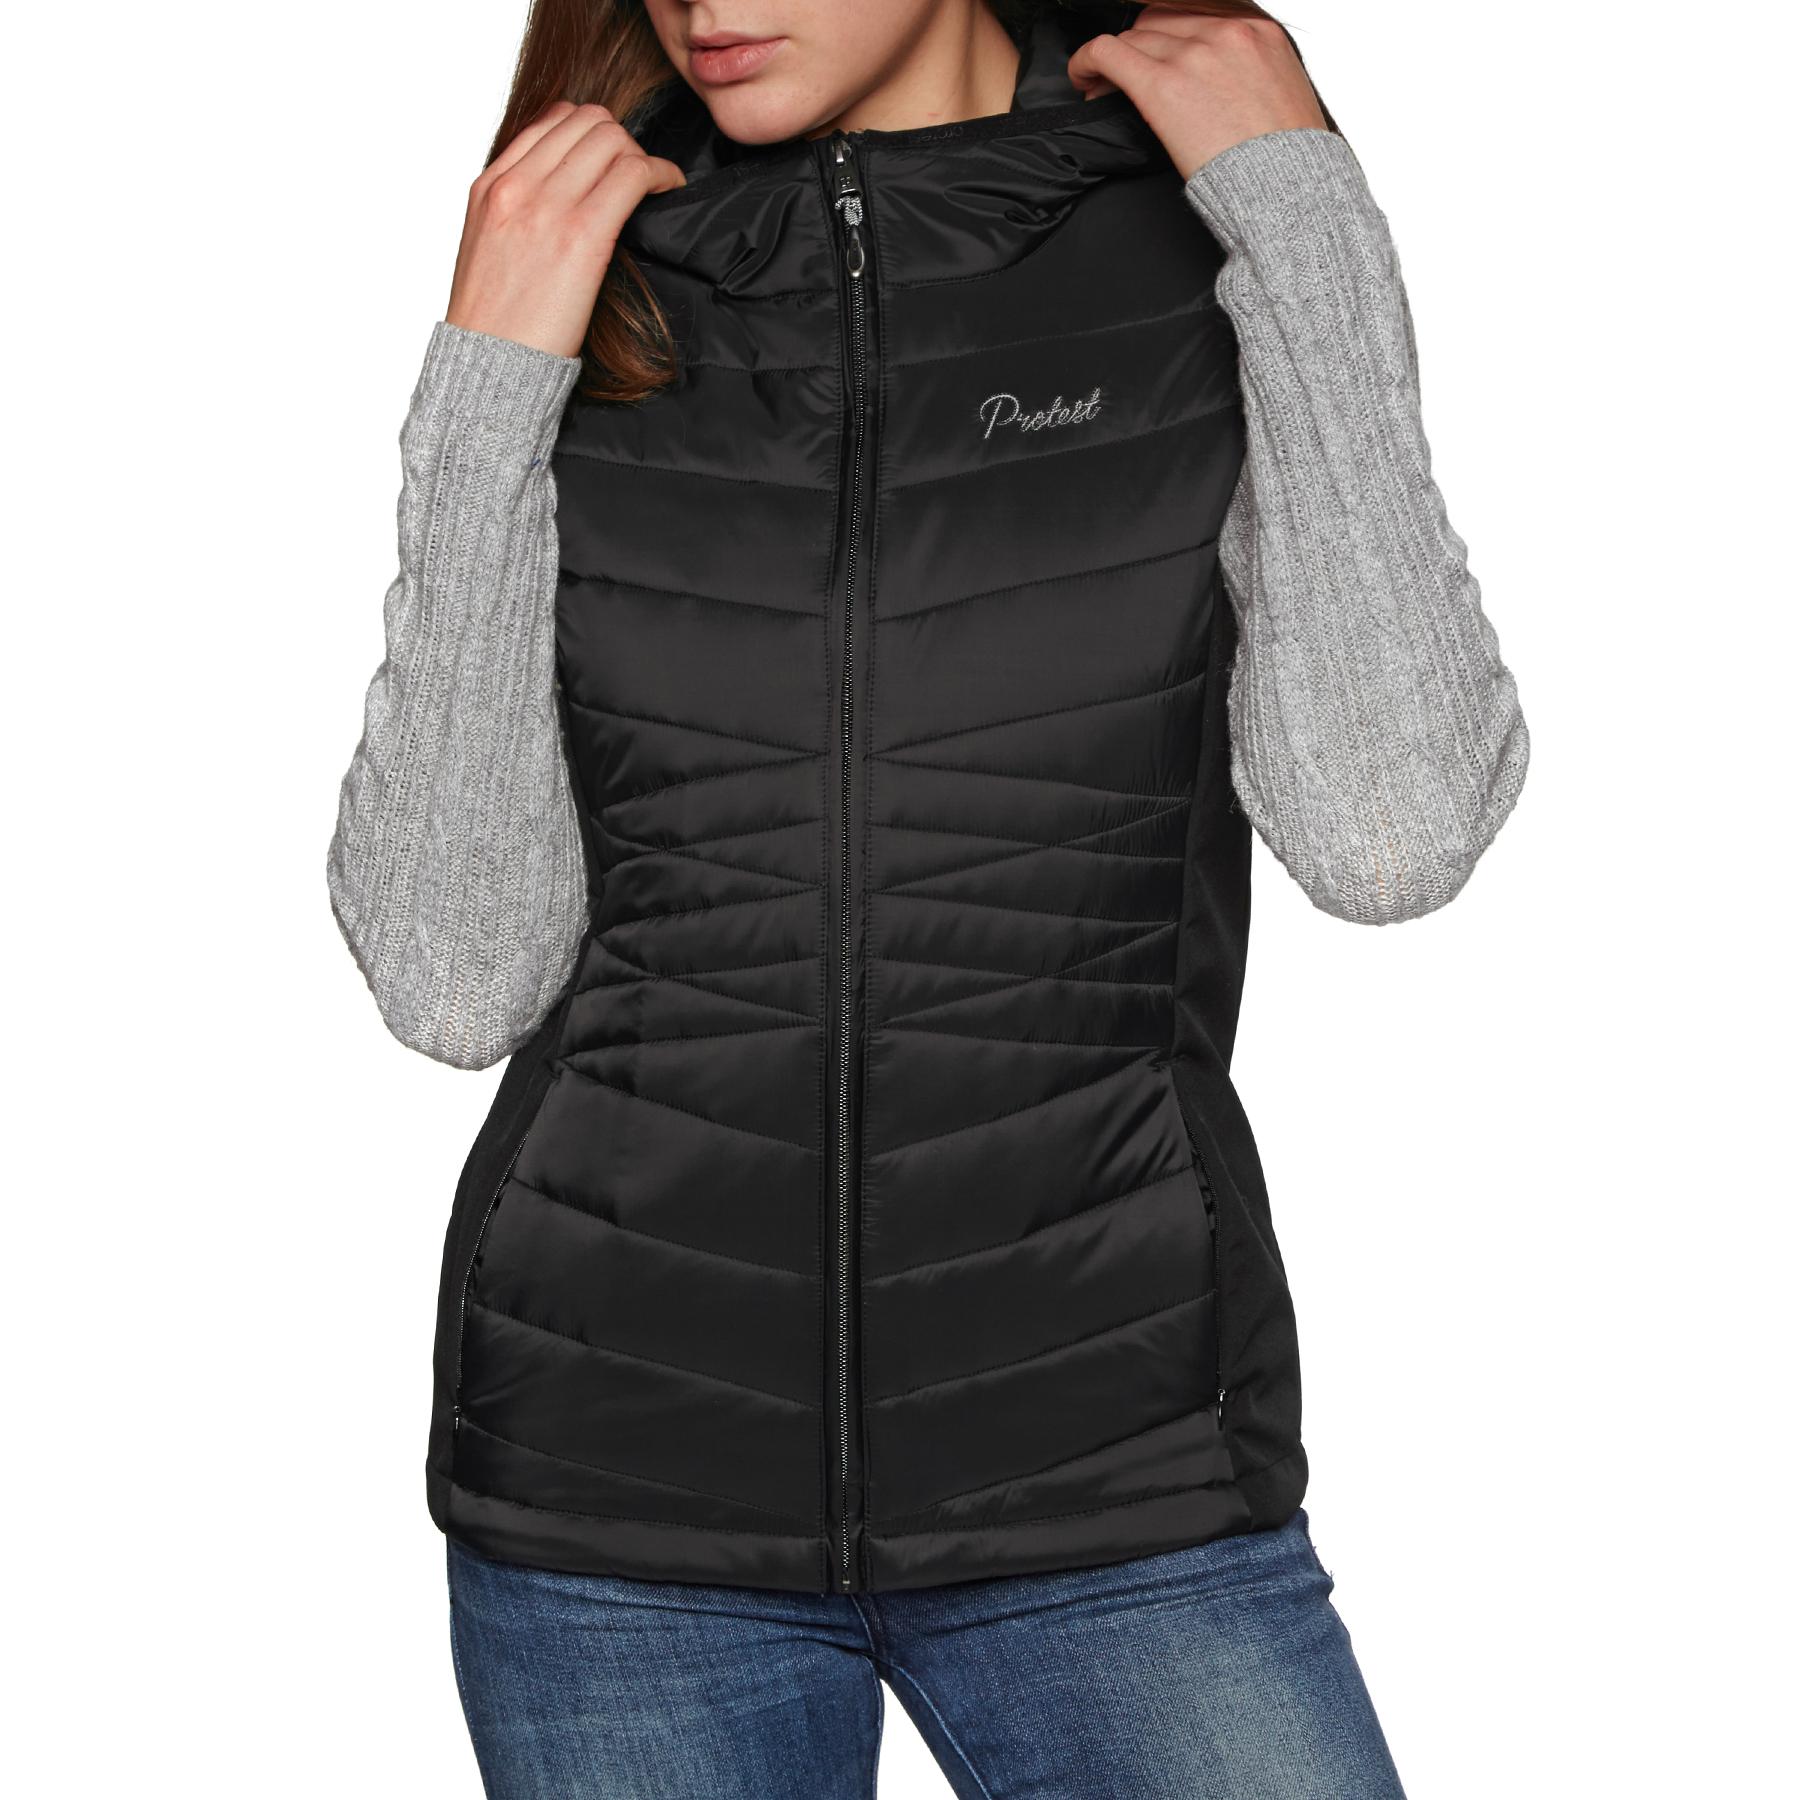 Protest Palmer Womens Jacket Gilet - True Black All Sizes | eBay